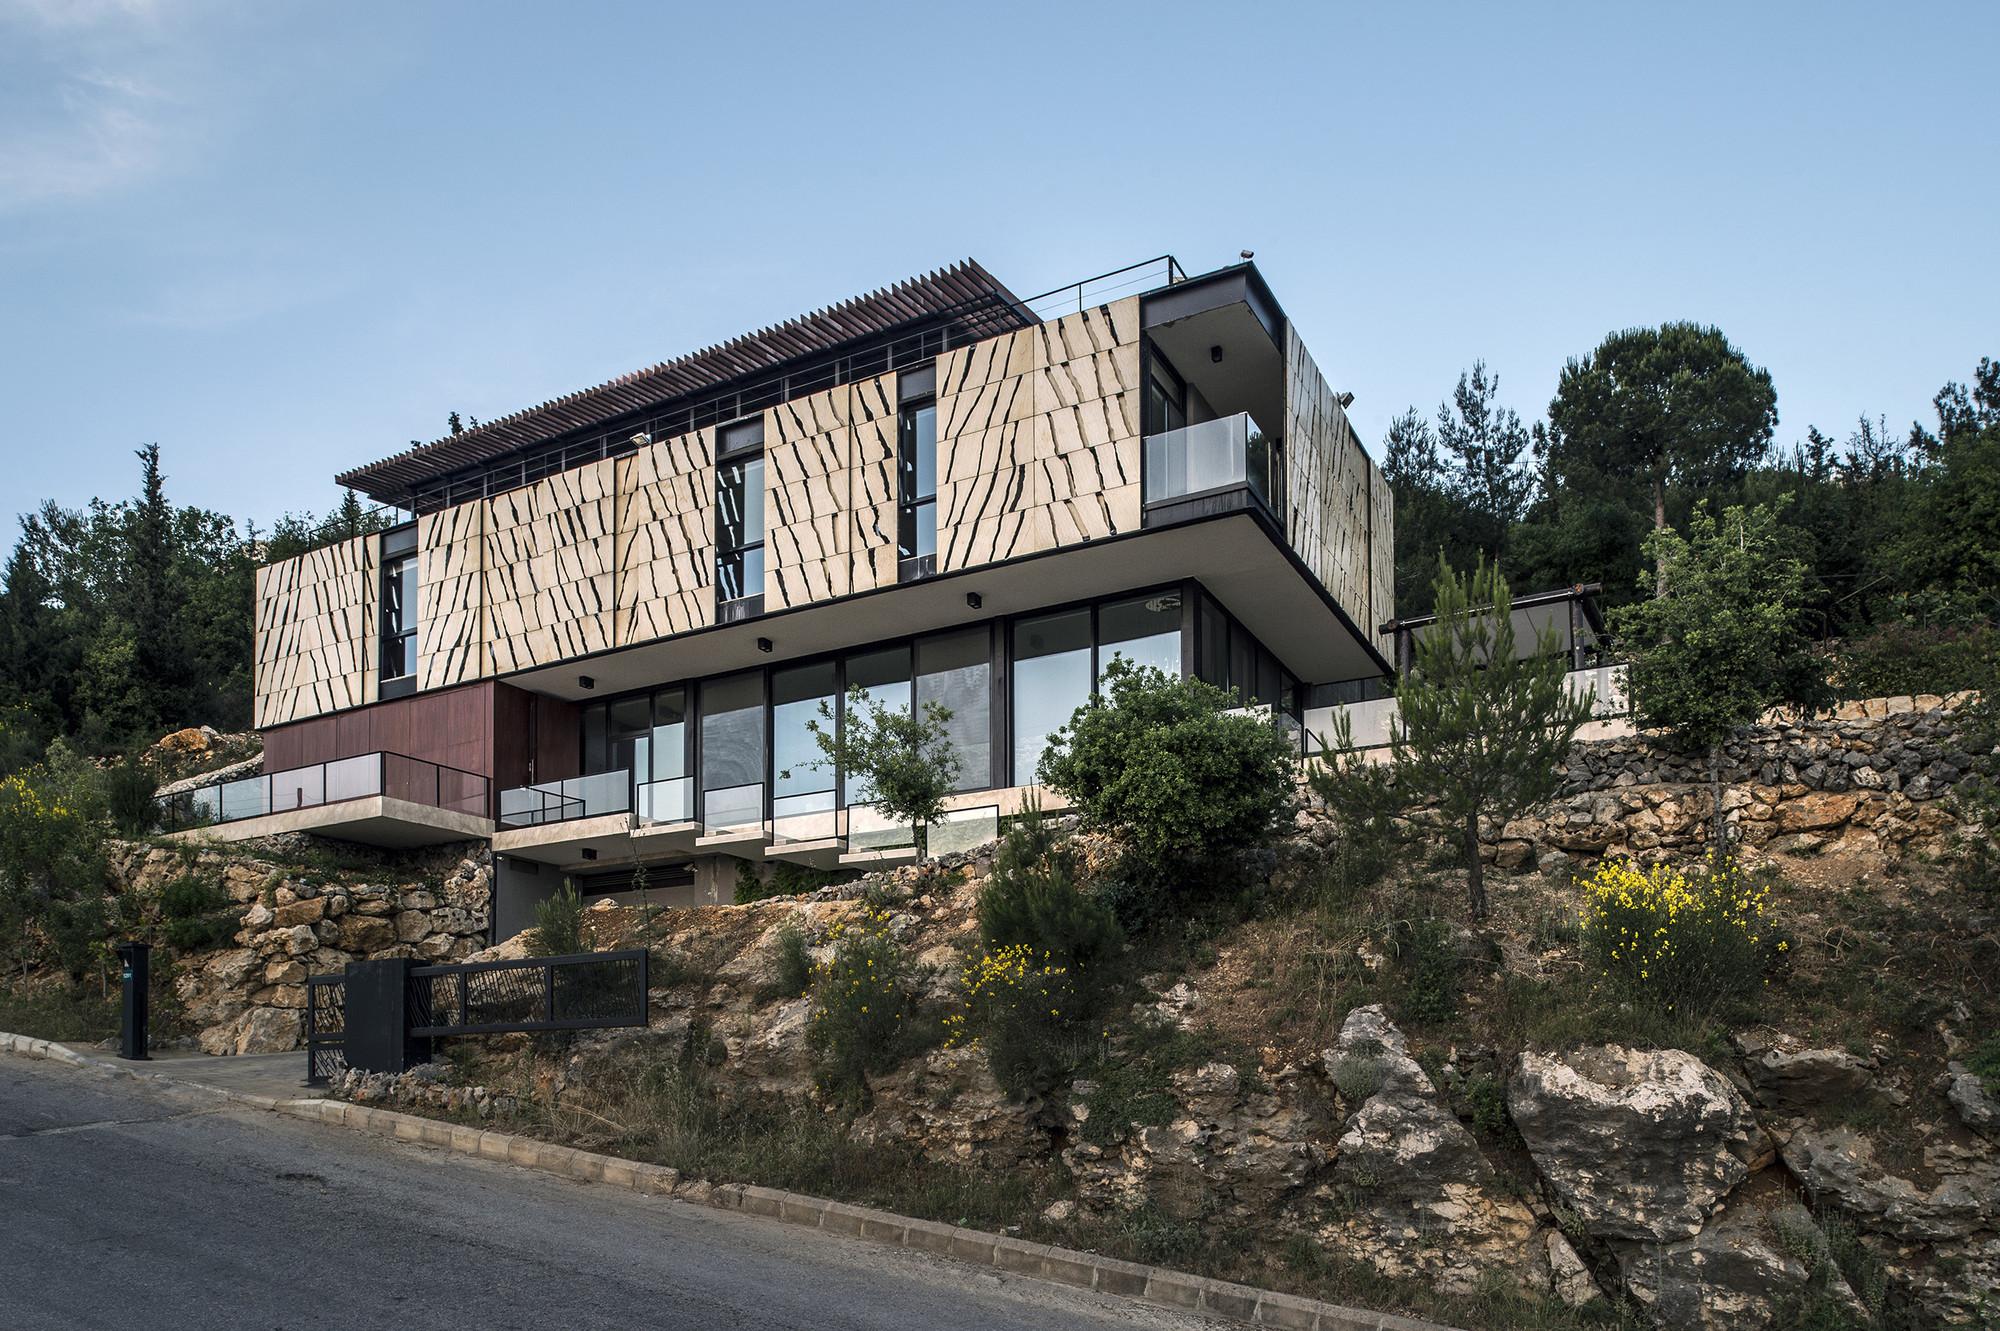 Tahan Villa / BLANKPAGE Architects, © Ieva Saudargaitė